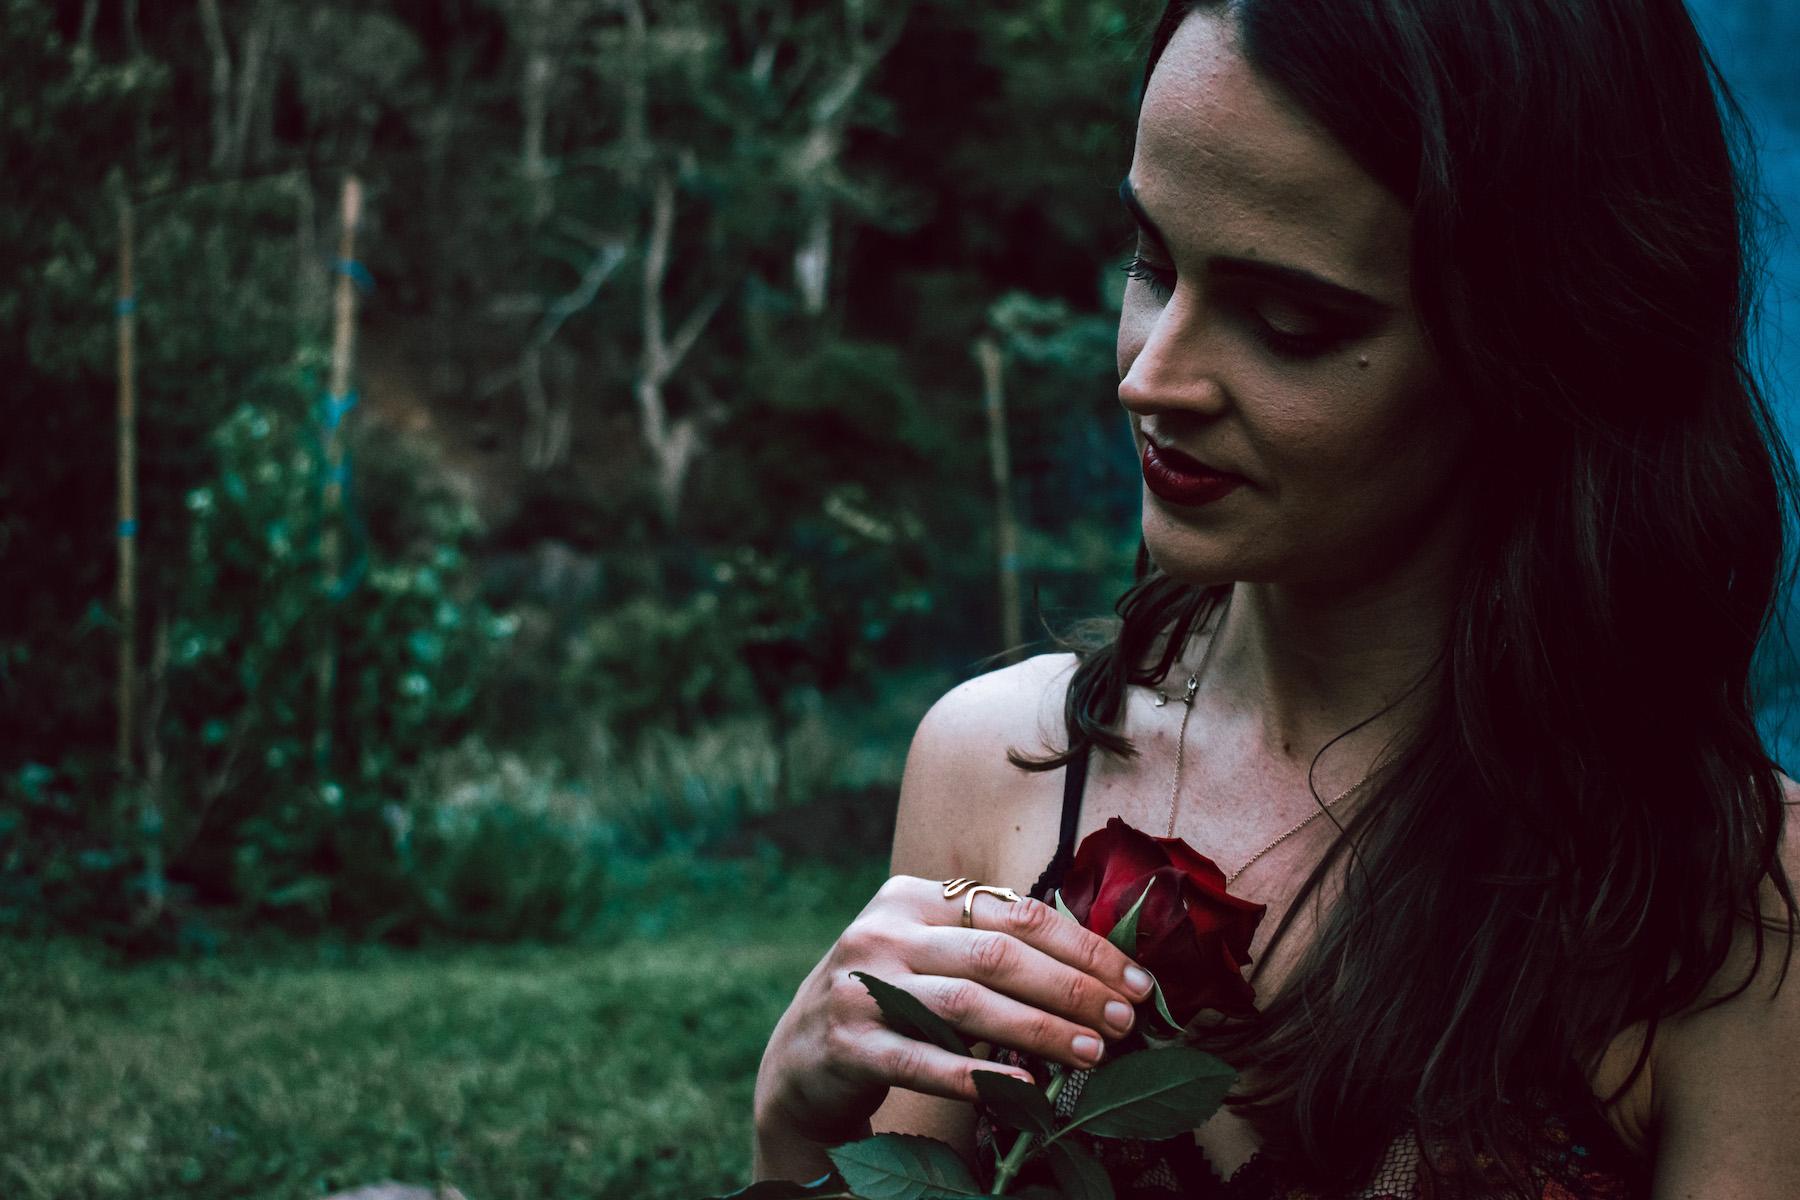 Jasmine Rose at heart